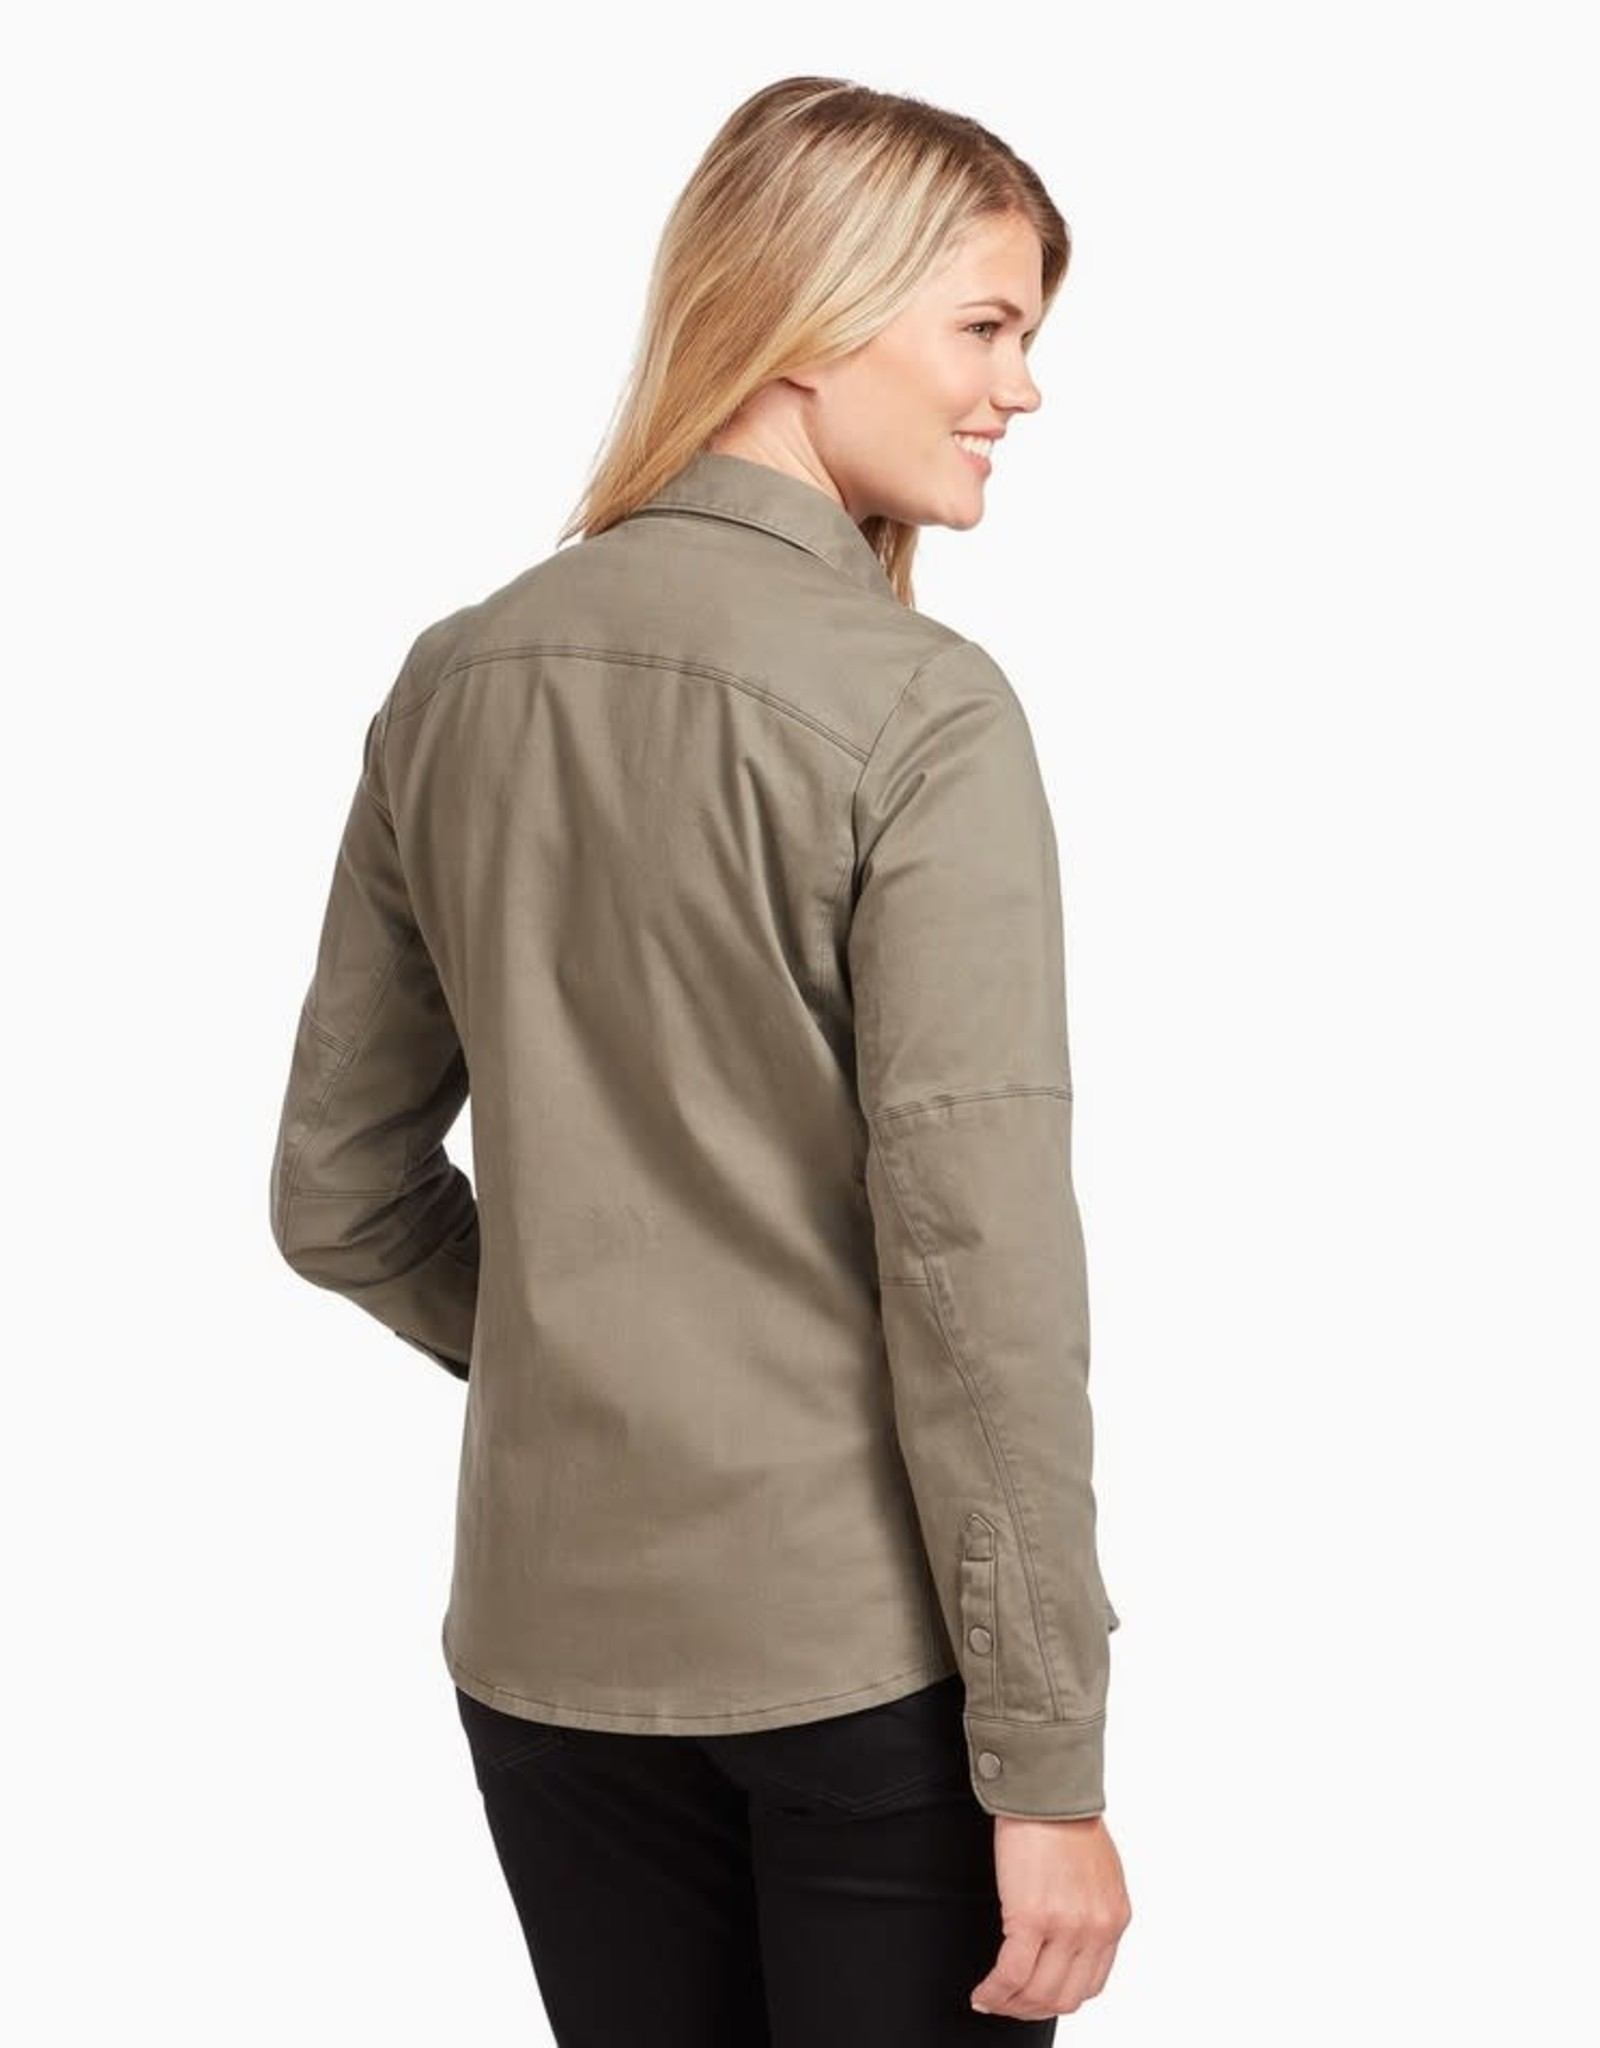 Kuhl Generatr jacket